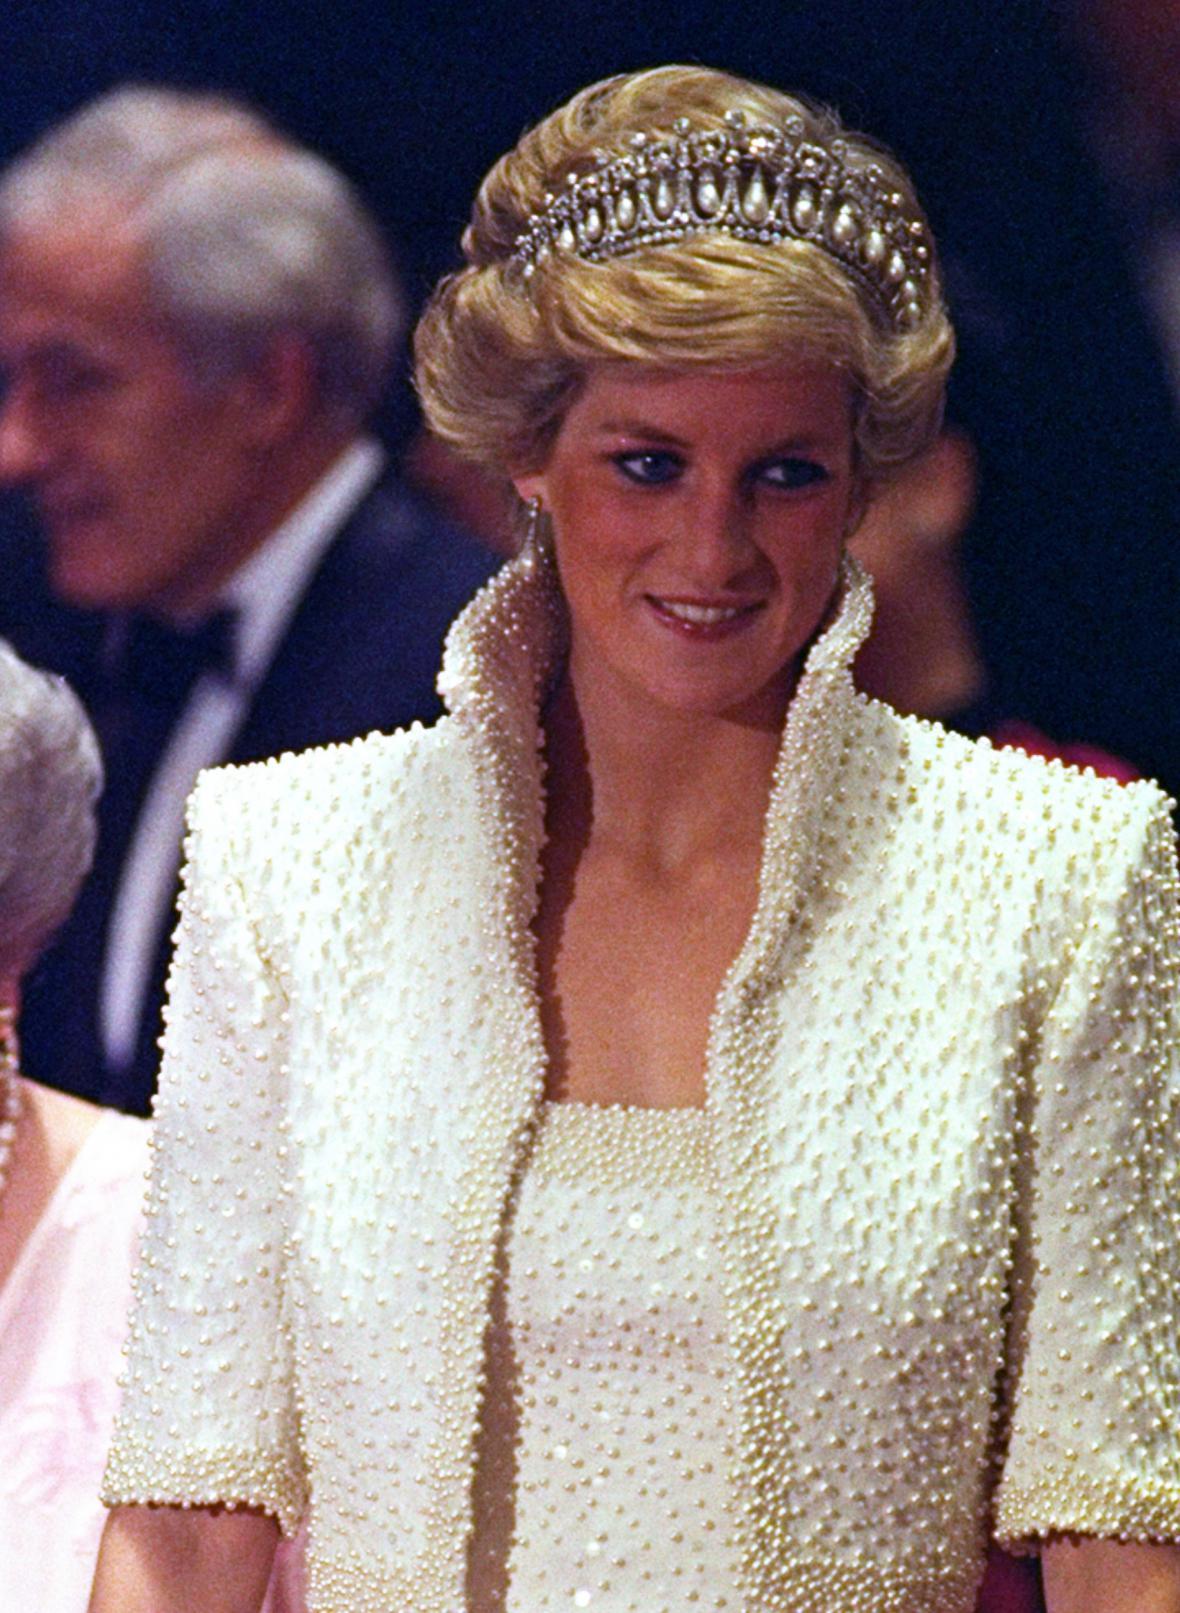 V roce 1989 během návštěvy Hongkongu uchvátila Diana šaty posetými perlami